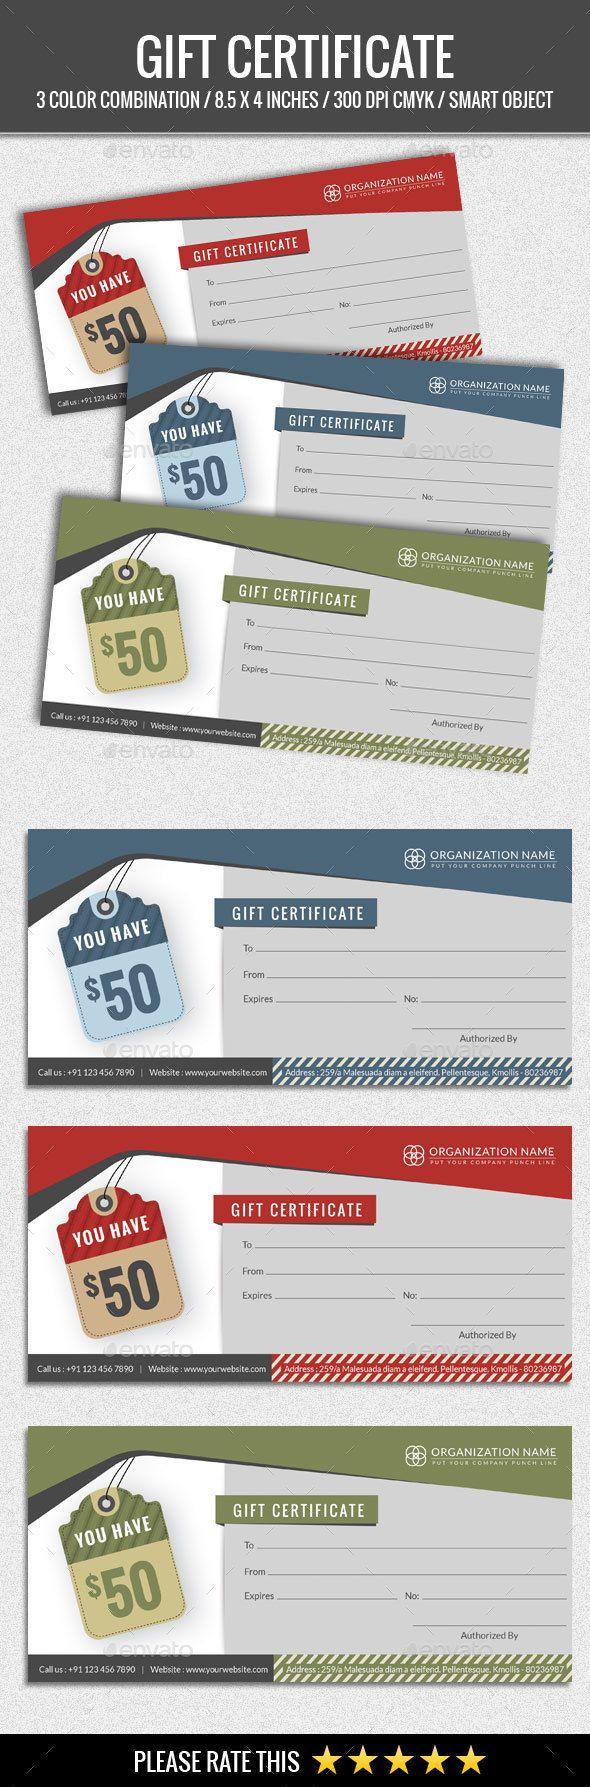 33 best Gift Voucher Templates images on Pinterest | Font logo, Gift ...